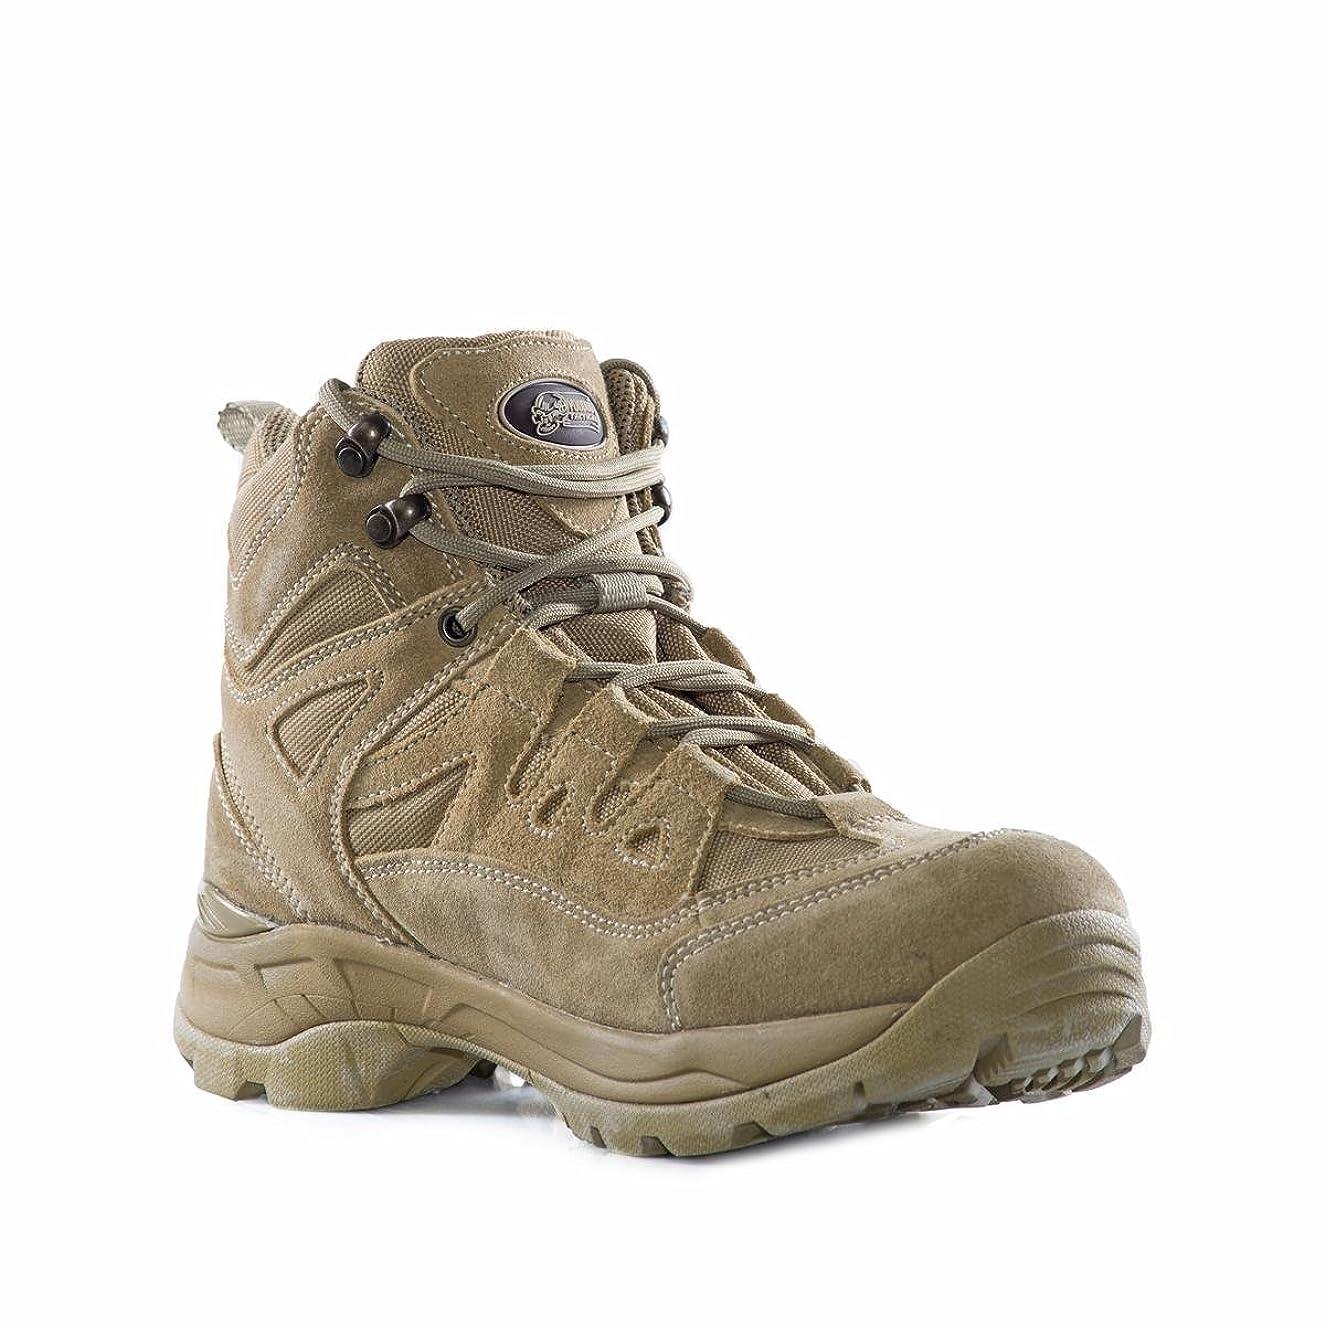 79de8e17f423a UPSTONE Work Shoes for Men, Indestructible Steel Toe Battlefield ...